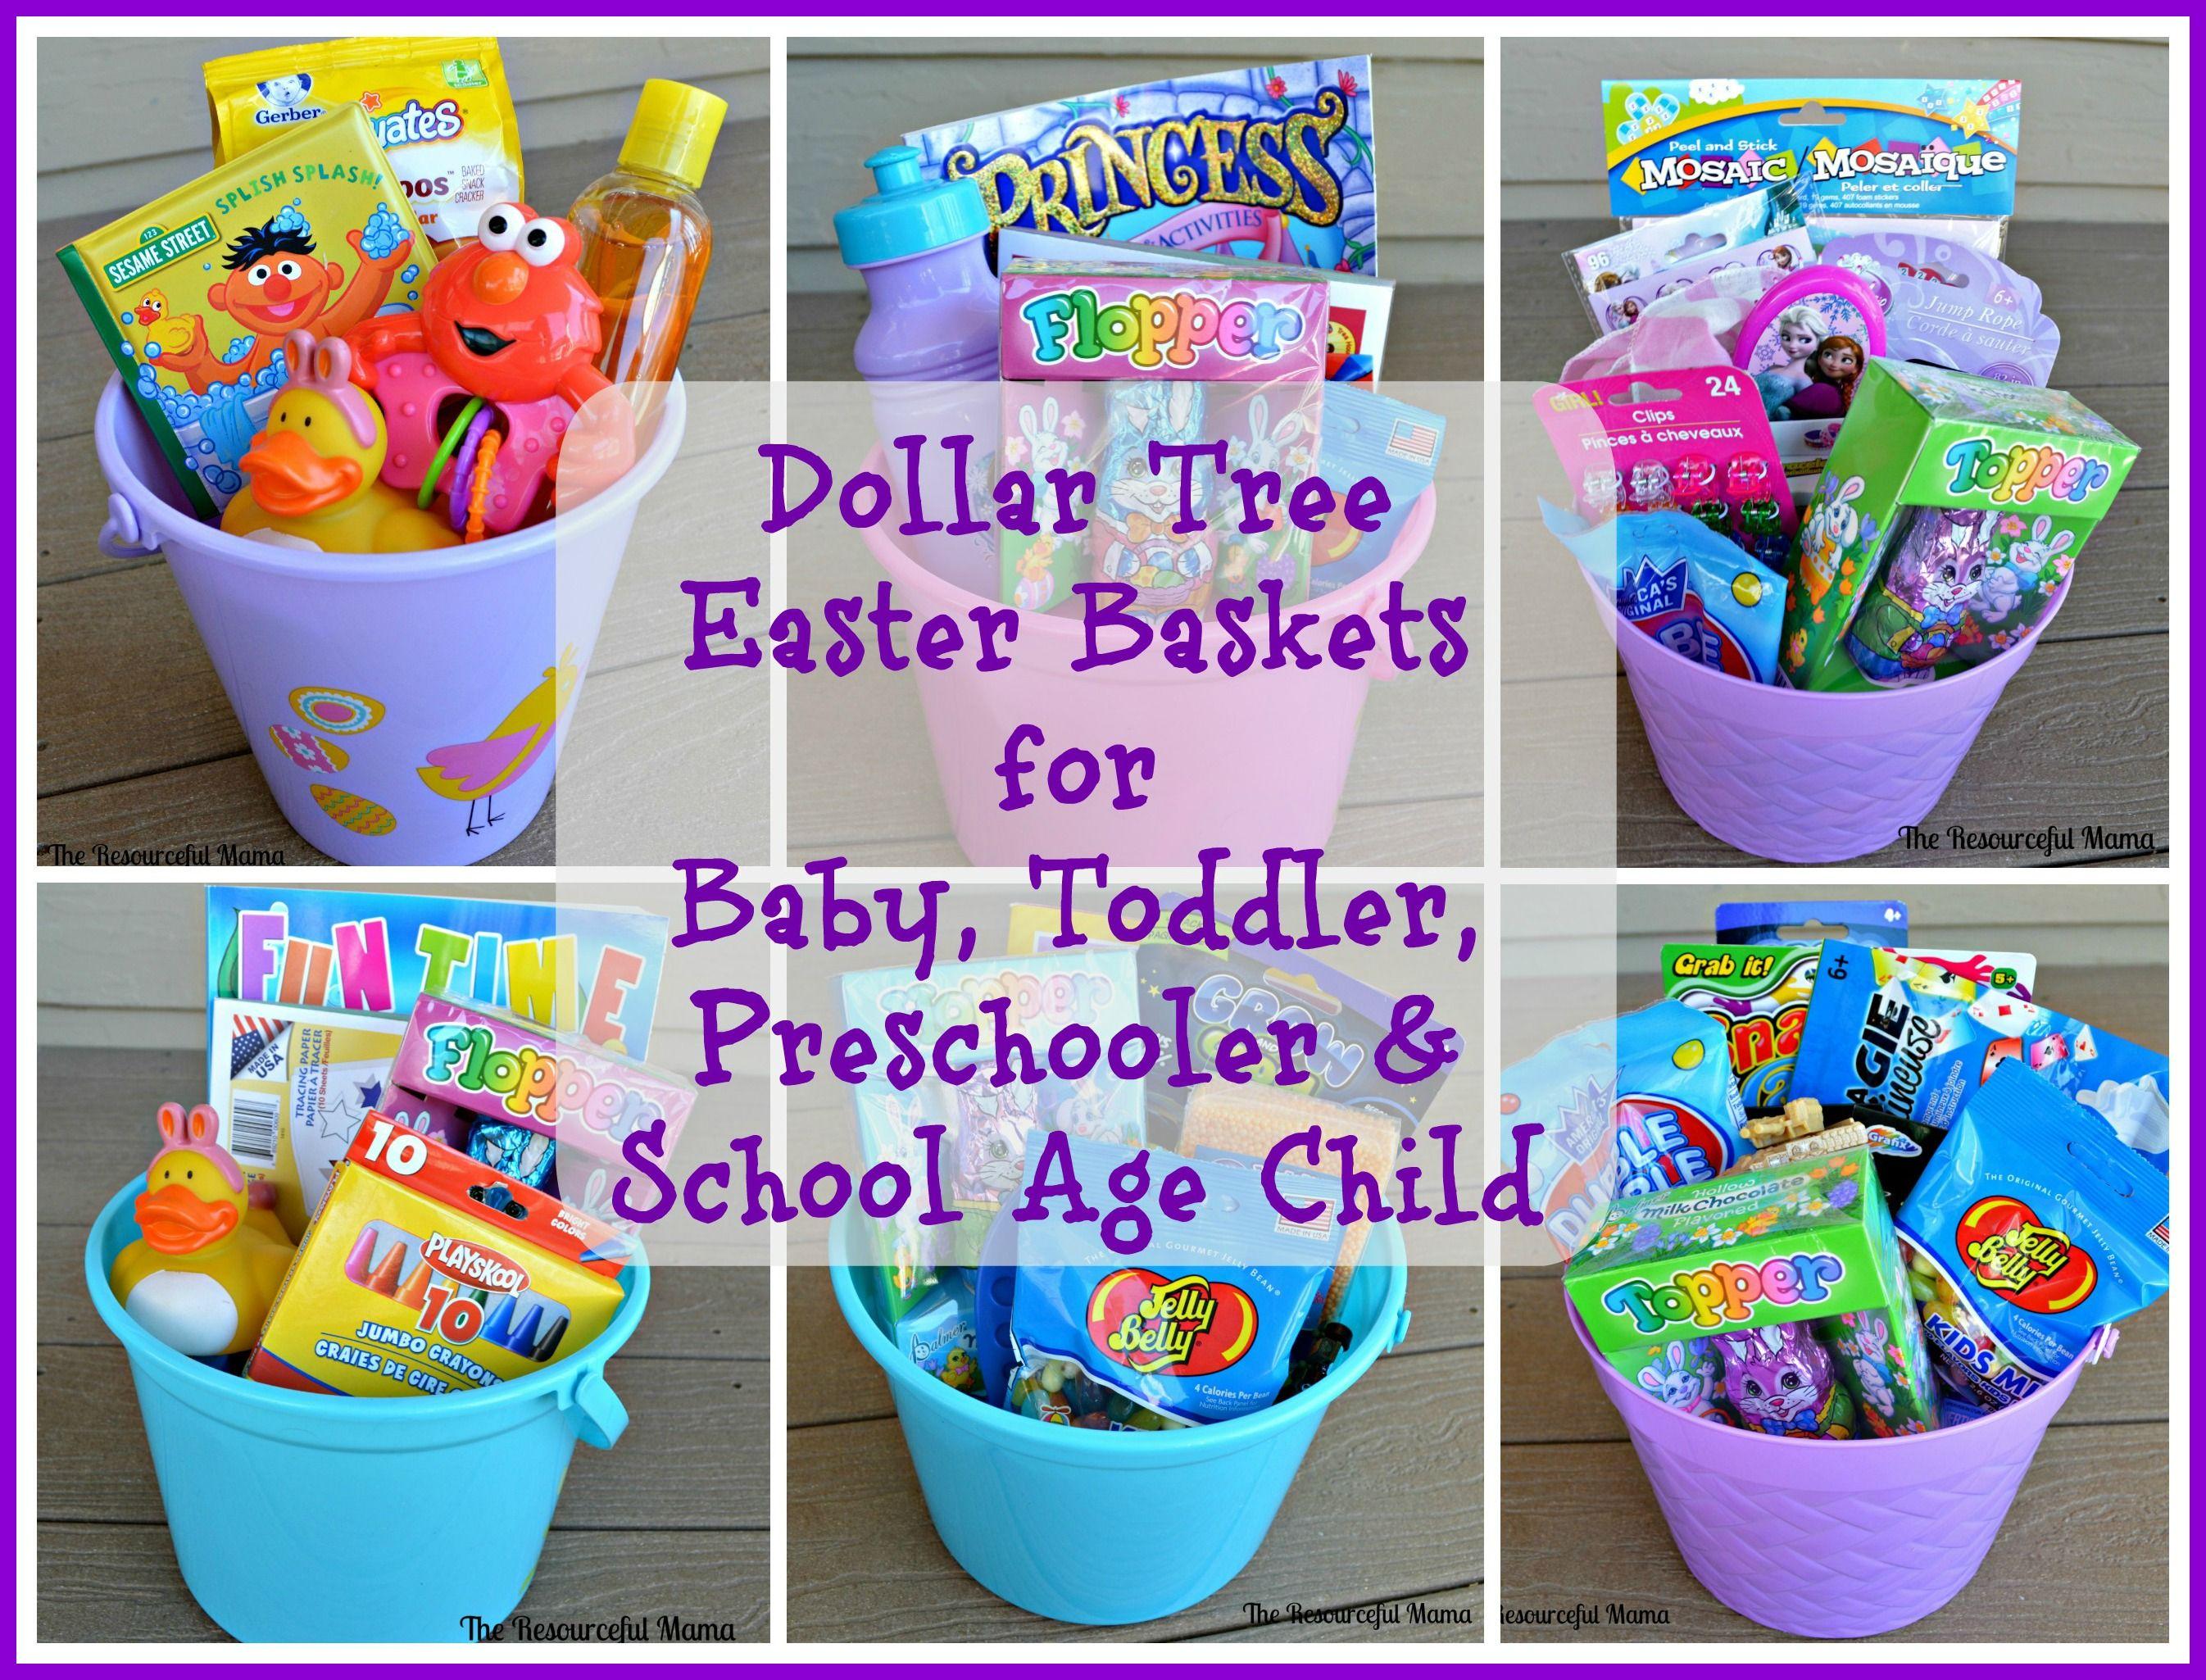 Dollar tree easter baskets dollar tree easter baskets and baskets dollar tree easter basket for baby toddler preschooler school age child negle Choice Image